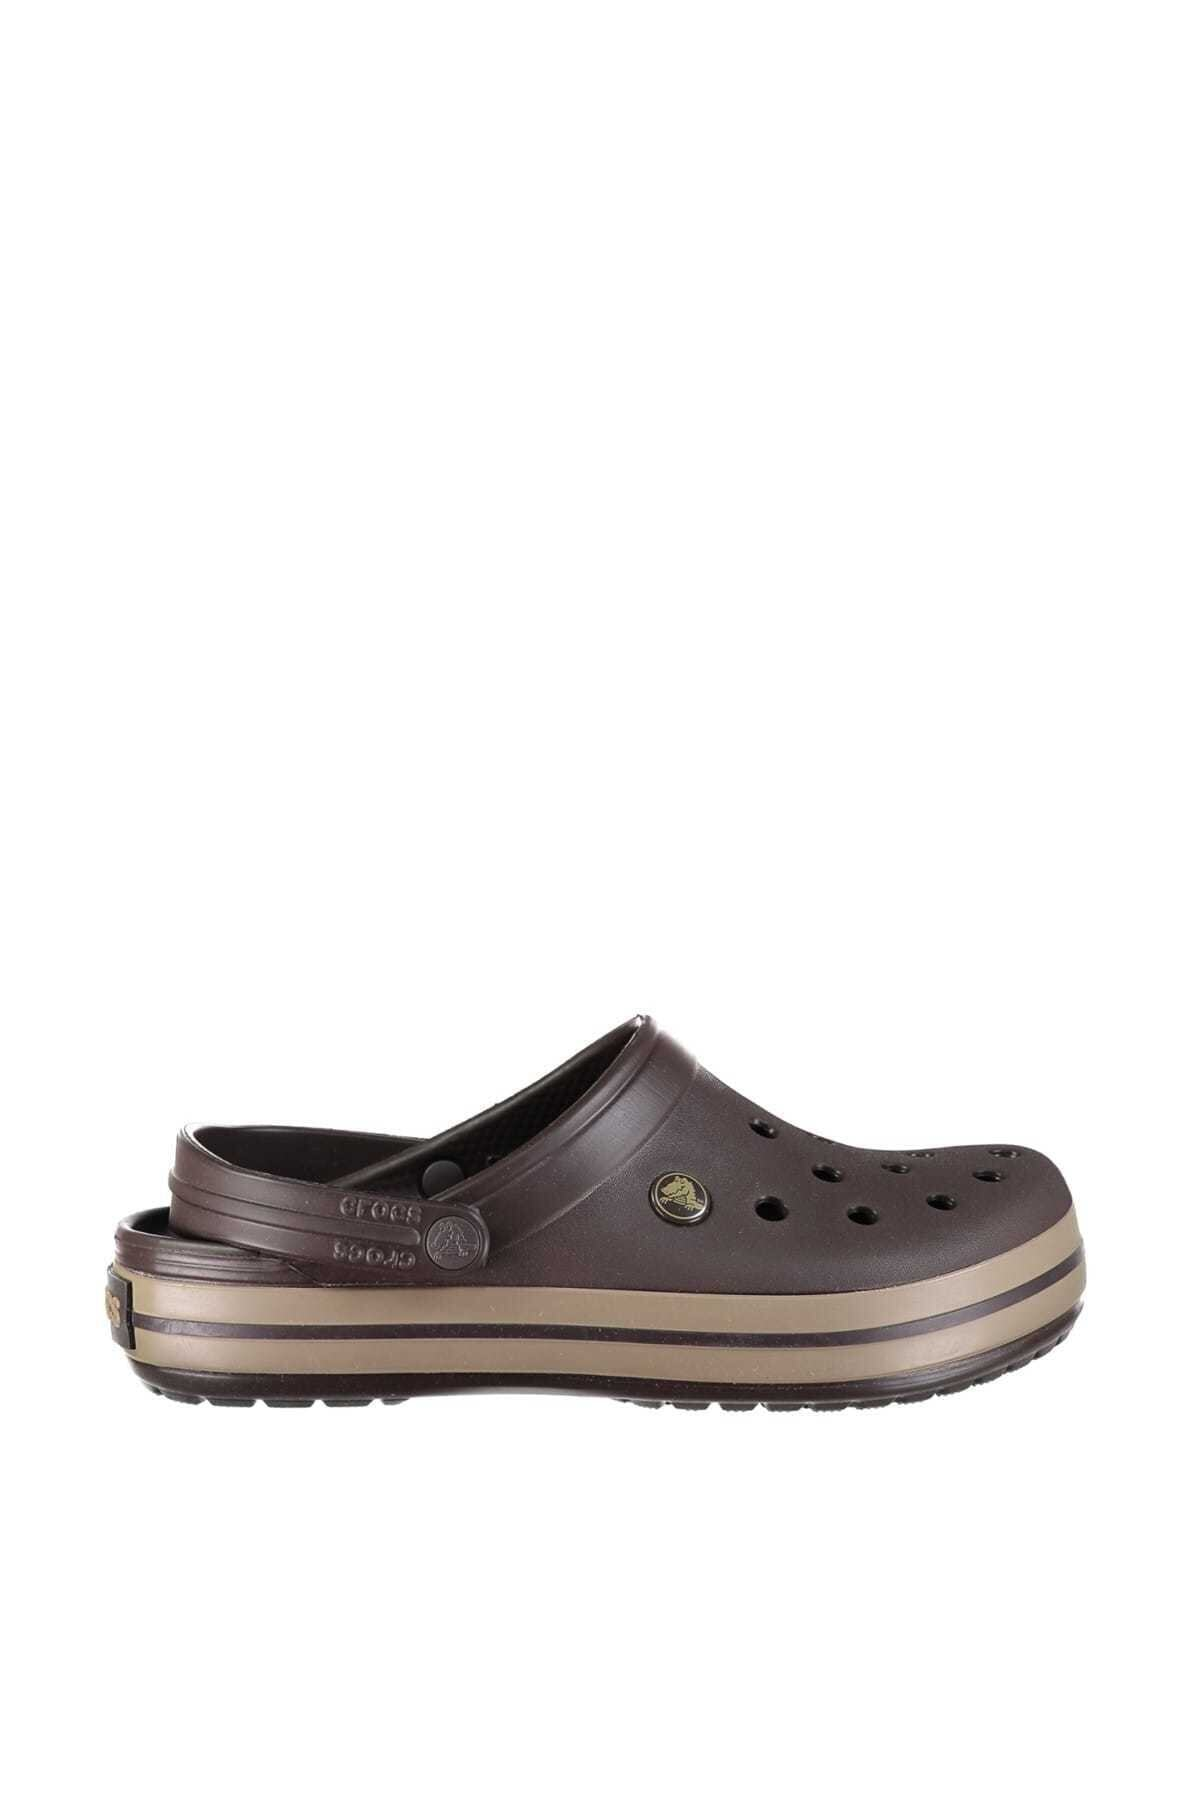 Crocs Crocband Unısex Sandalet Terlik 11016-22y 1